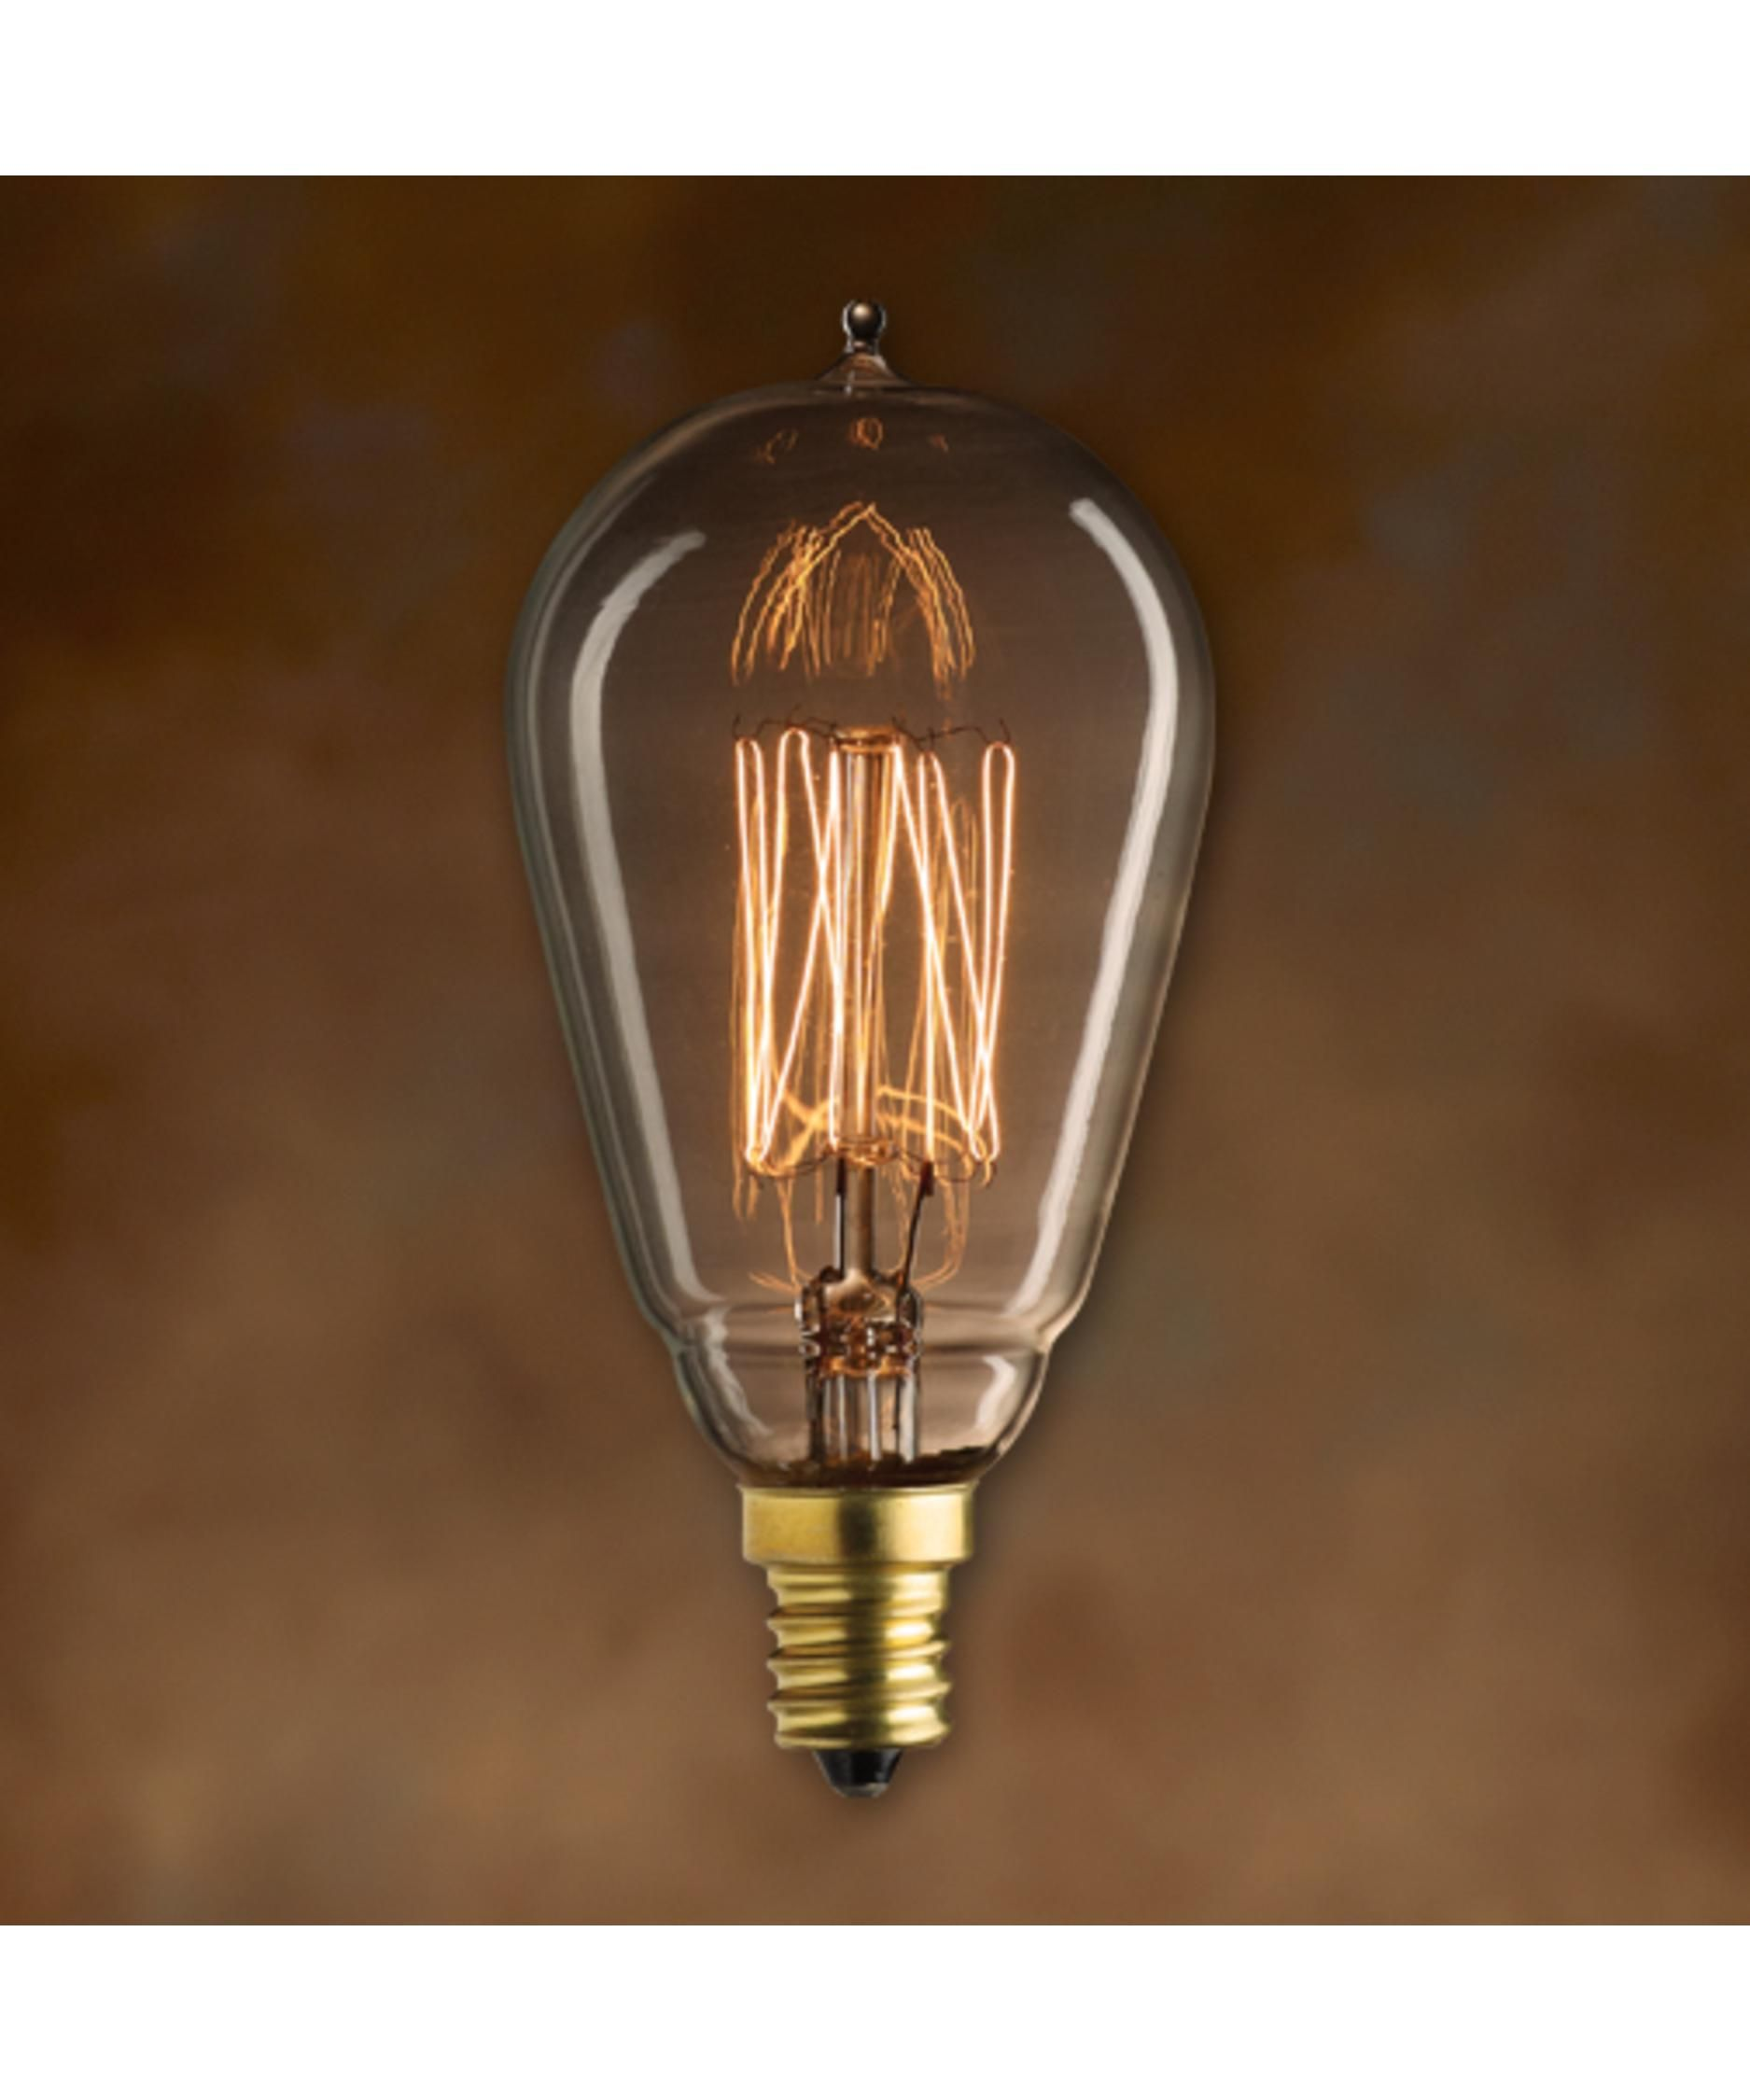 25 Watt 1800k St15 Vintage Light Bulb Capitol Lighting In 2020 Vintage Light Bulbs Edison Style Bulb Bulb